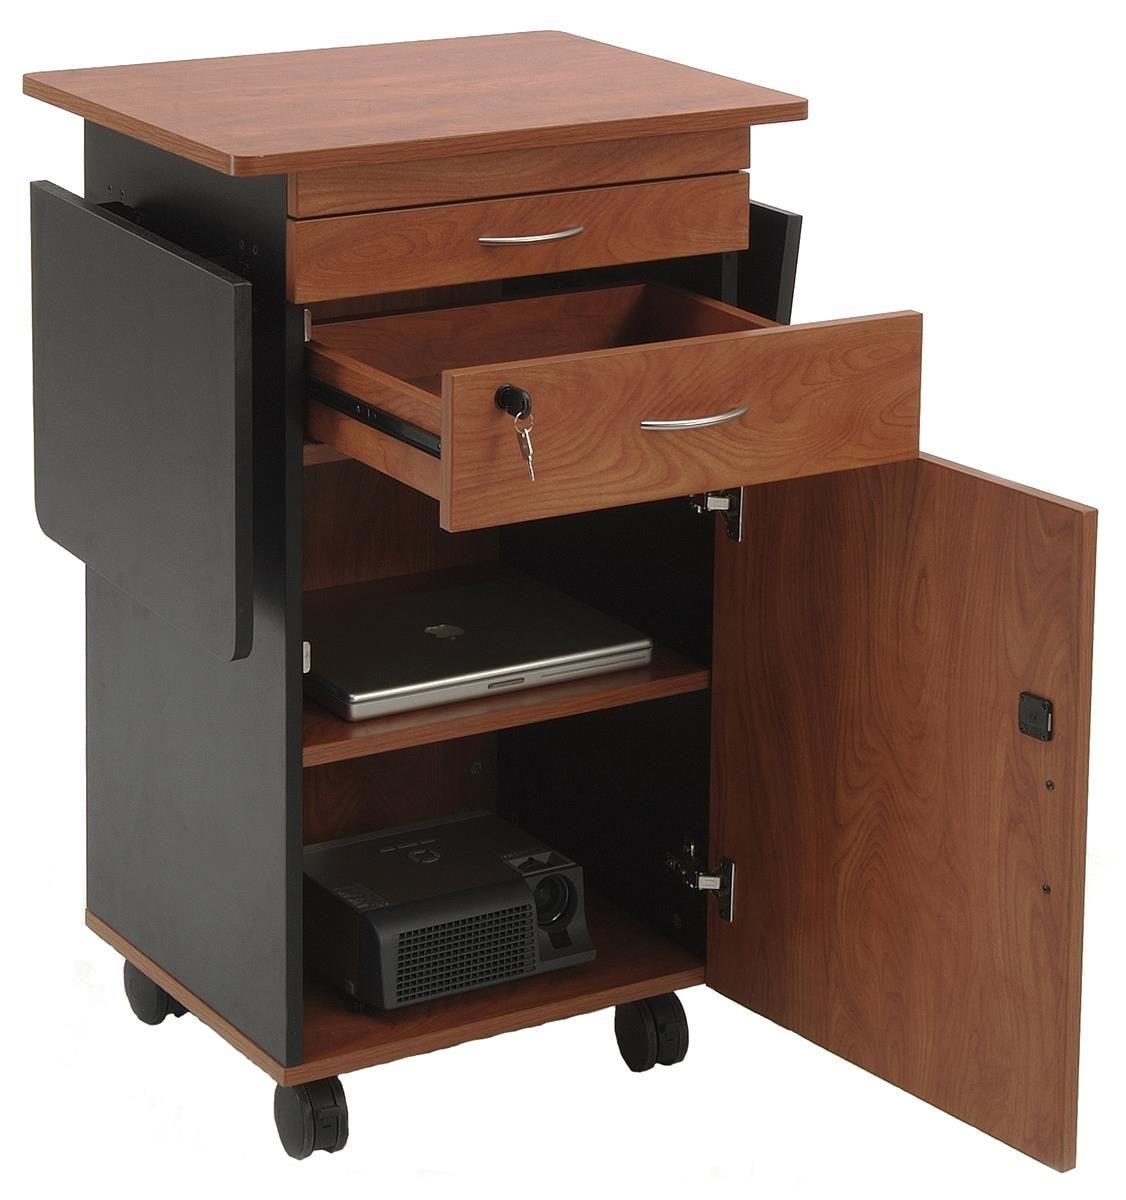 Multimedia Podium With Storage Cabinet Laptop Tray And Side Shelves Cherry Storage Laptop Tray Adjustable Shelving